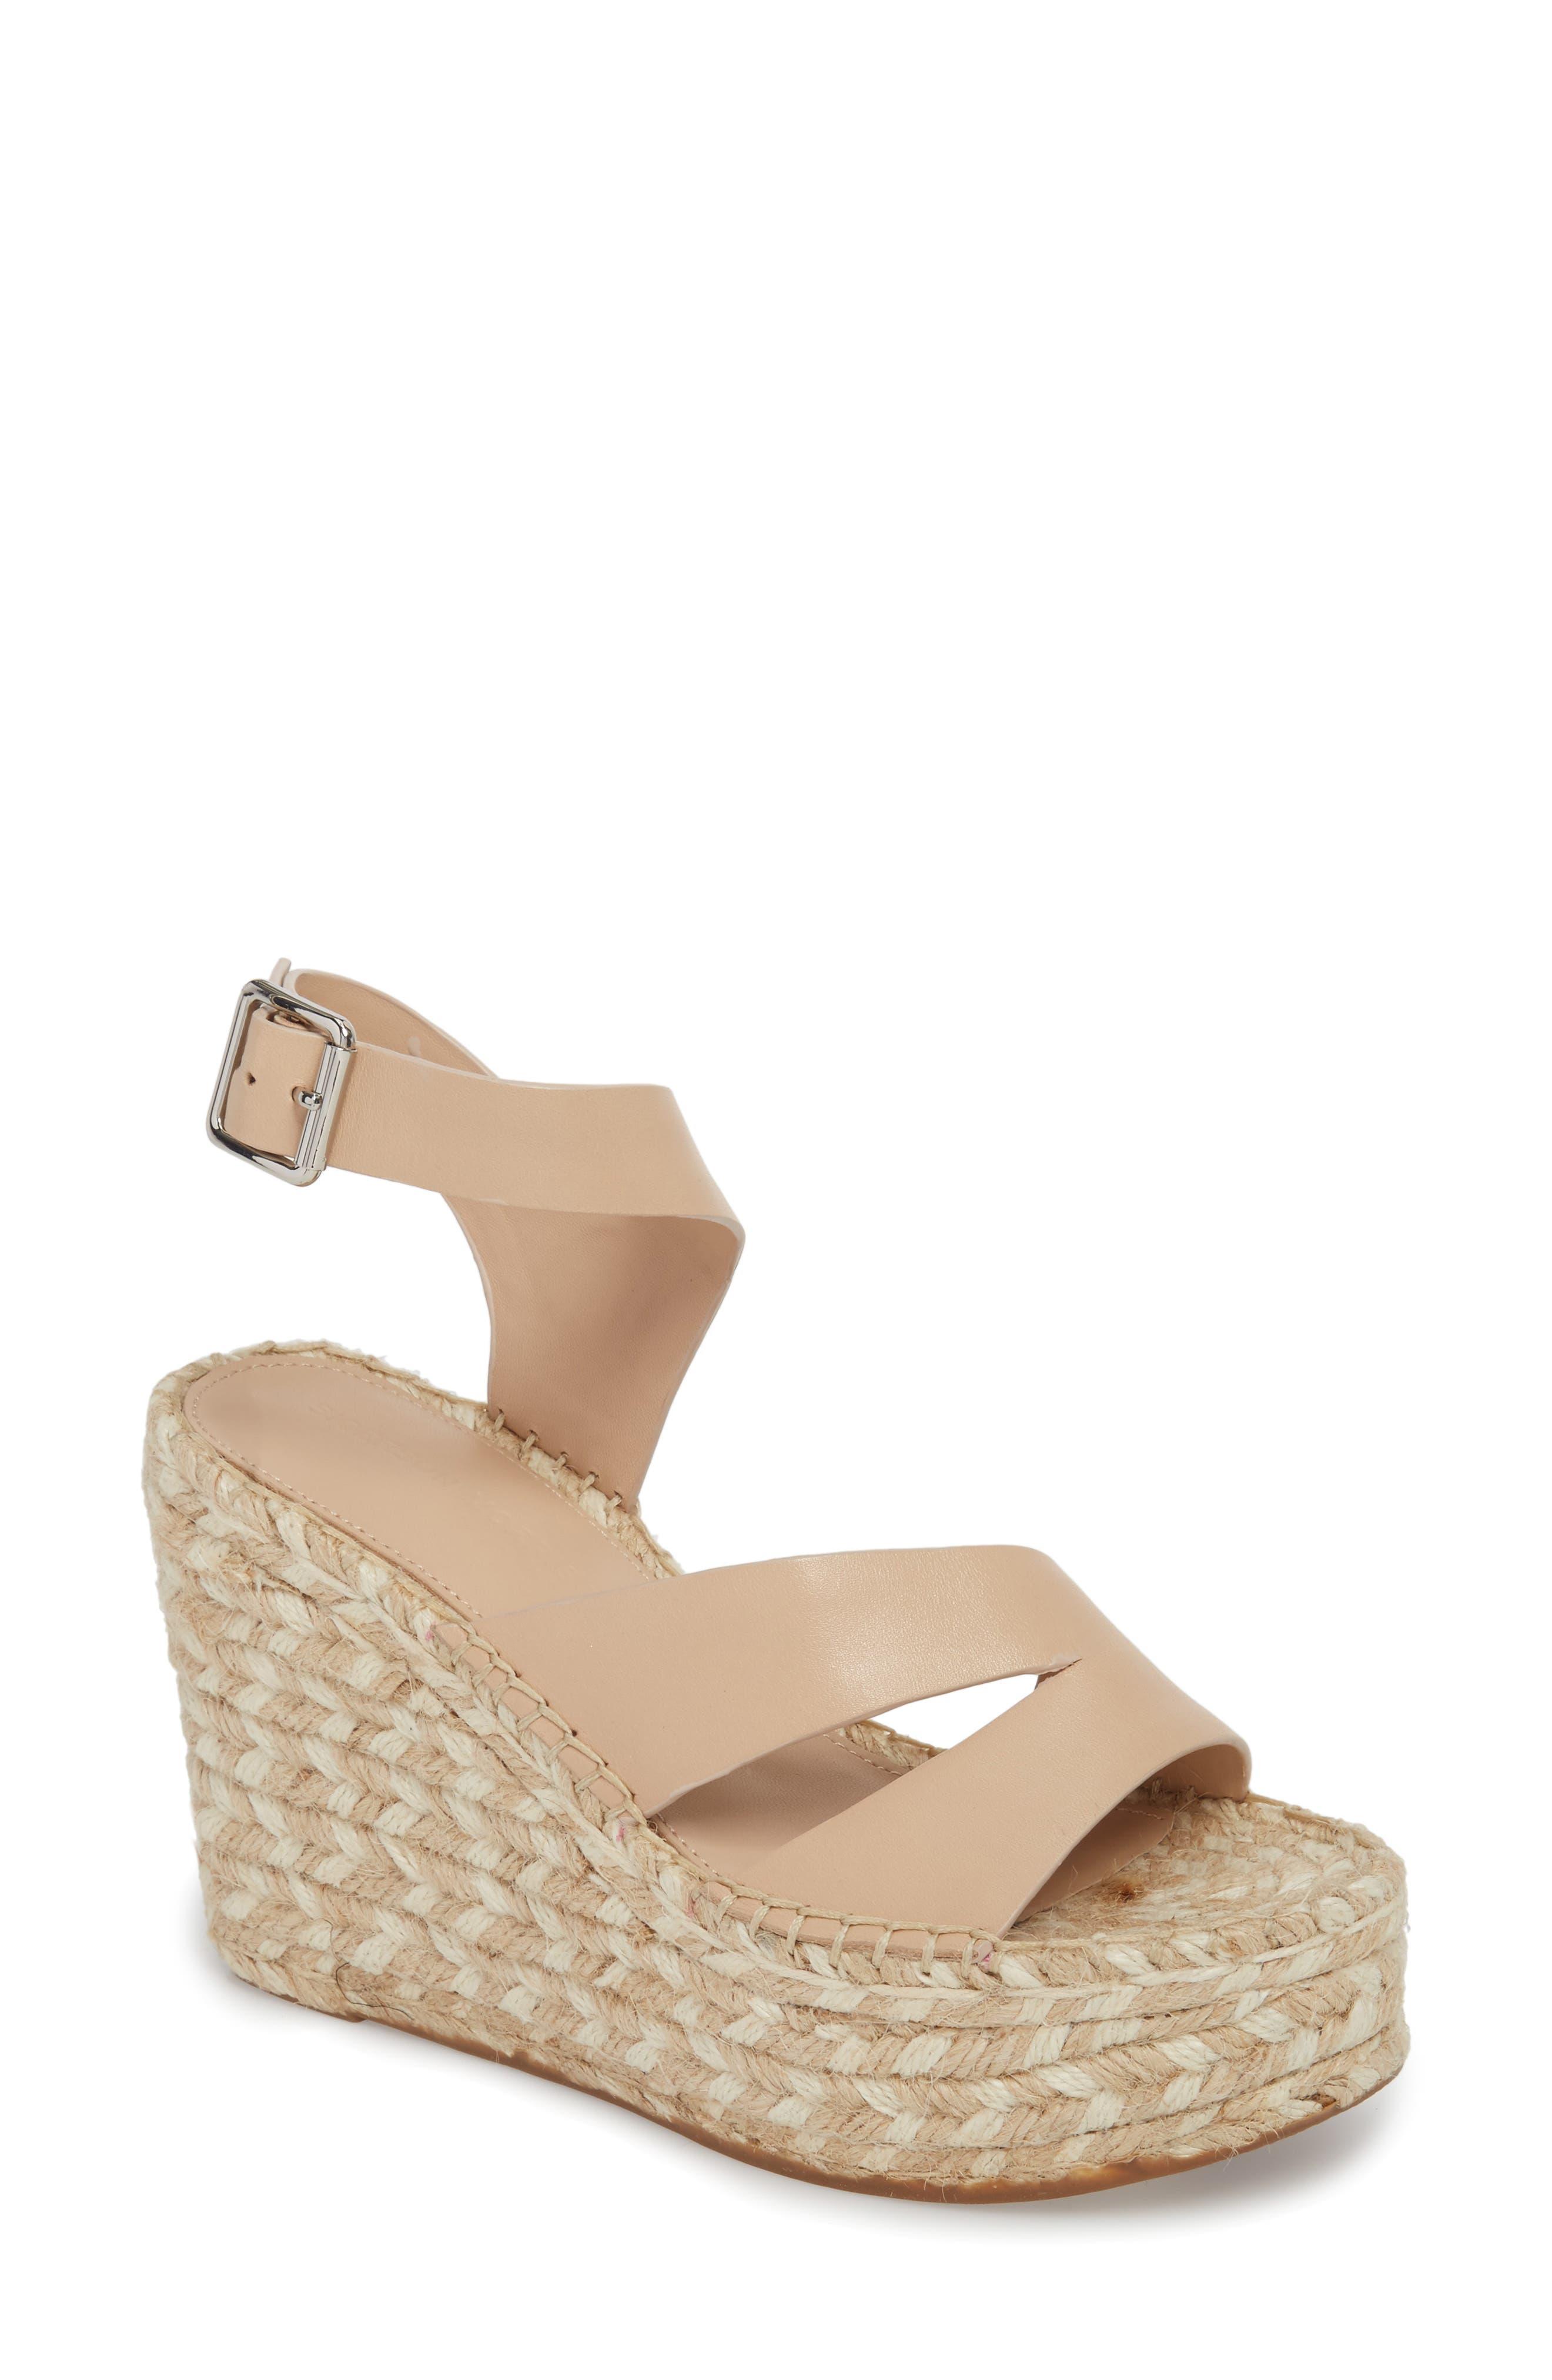 Sigerson Morrison Wedge Espadrille Sandal (Women)